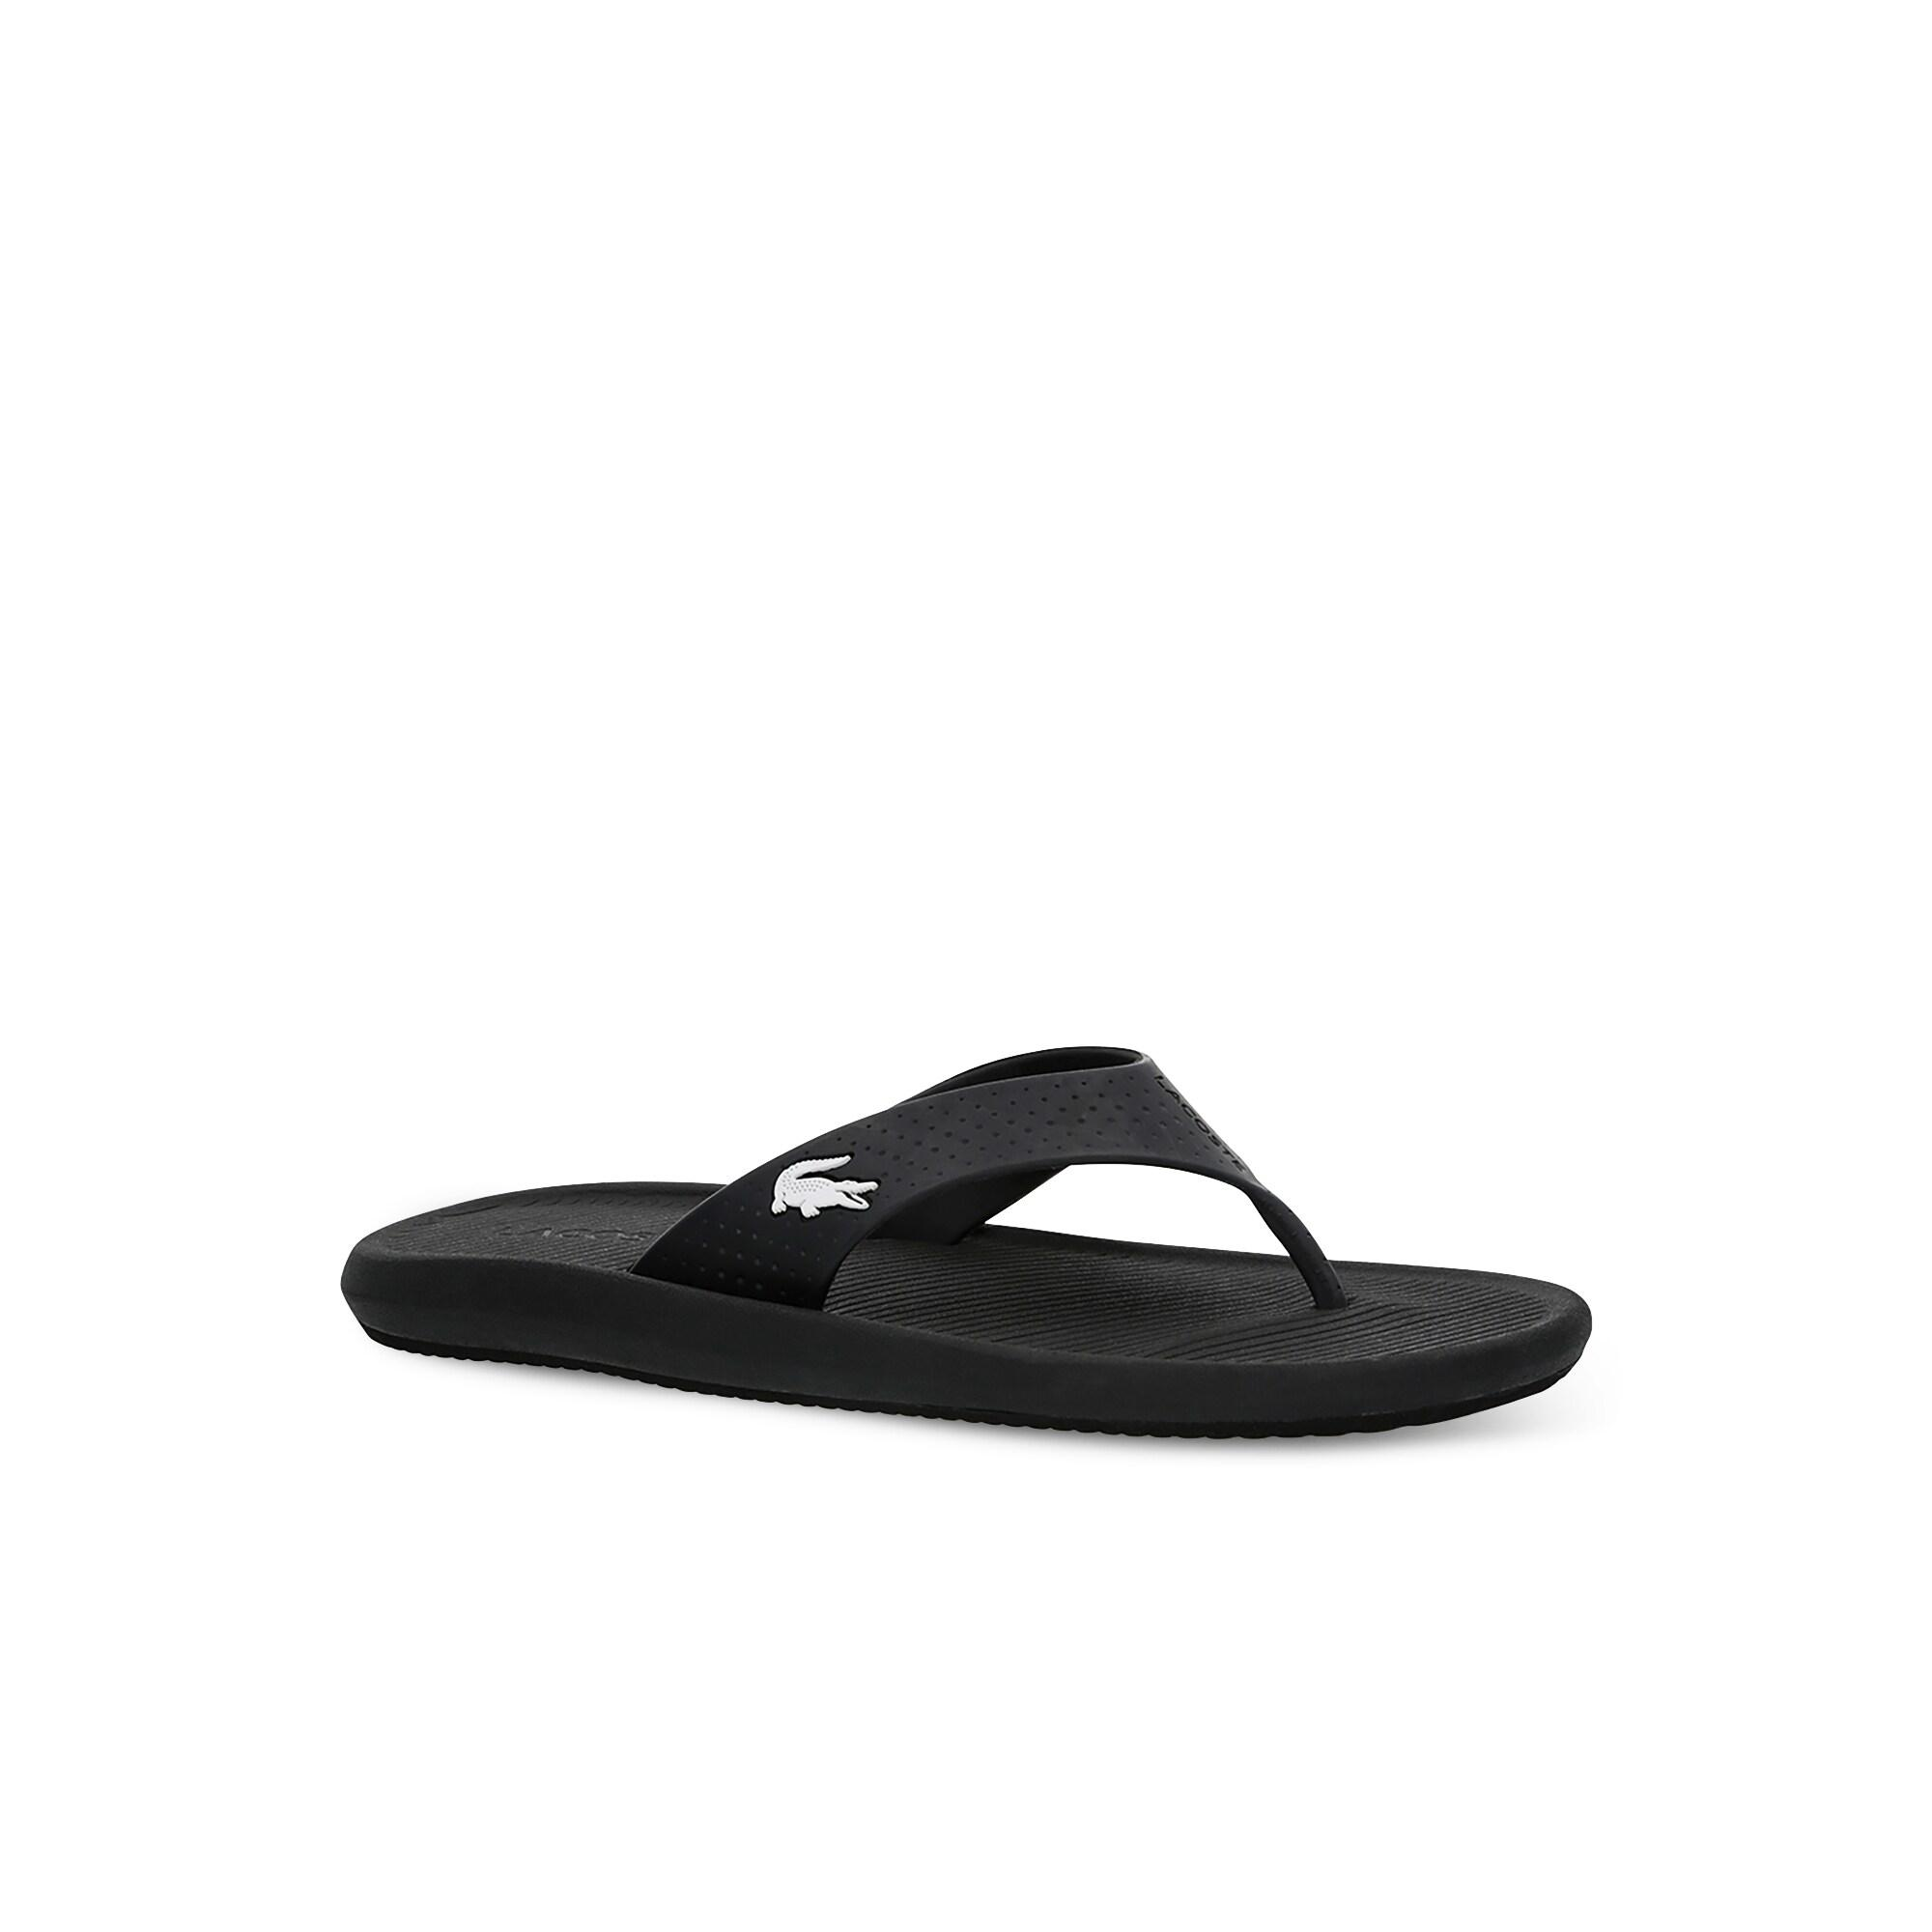 Lacoste Men's Croco Sandal 219 1 Cma Slippers